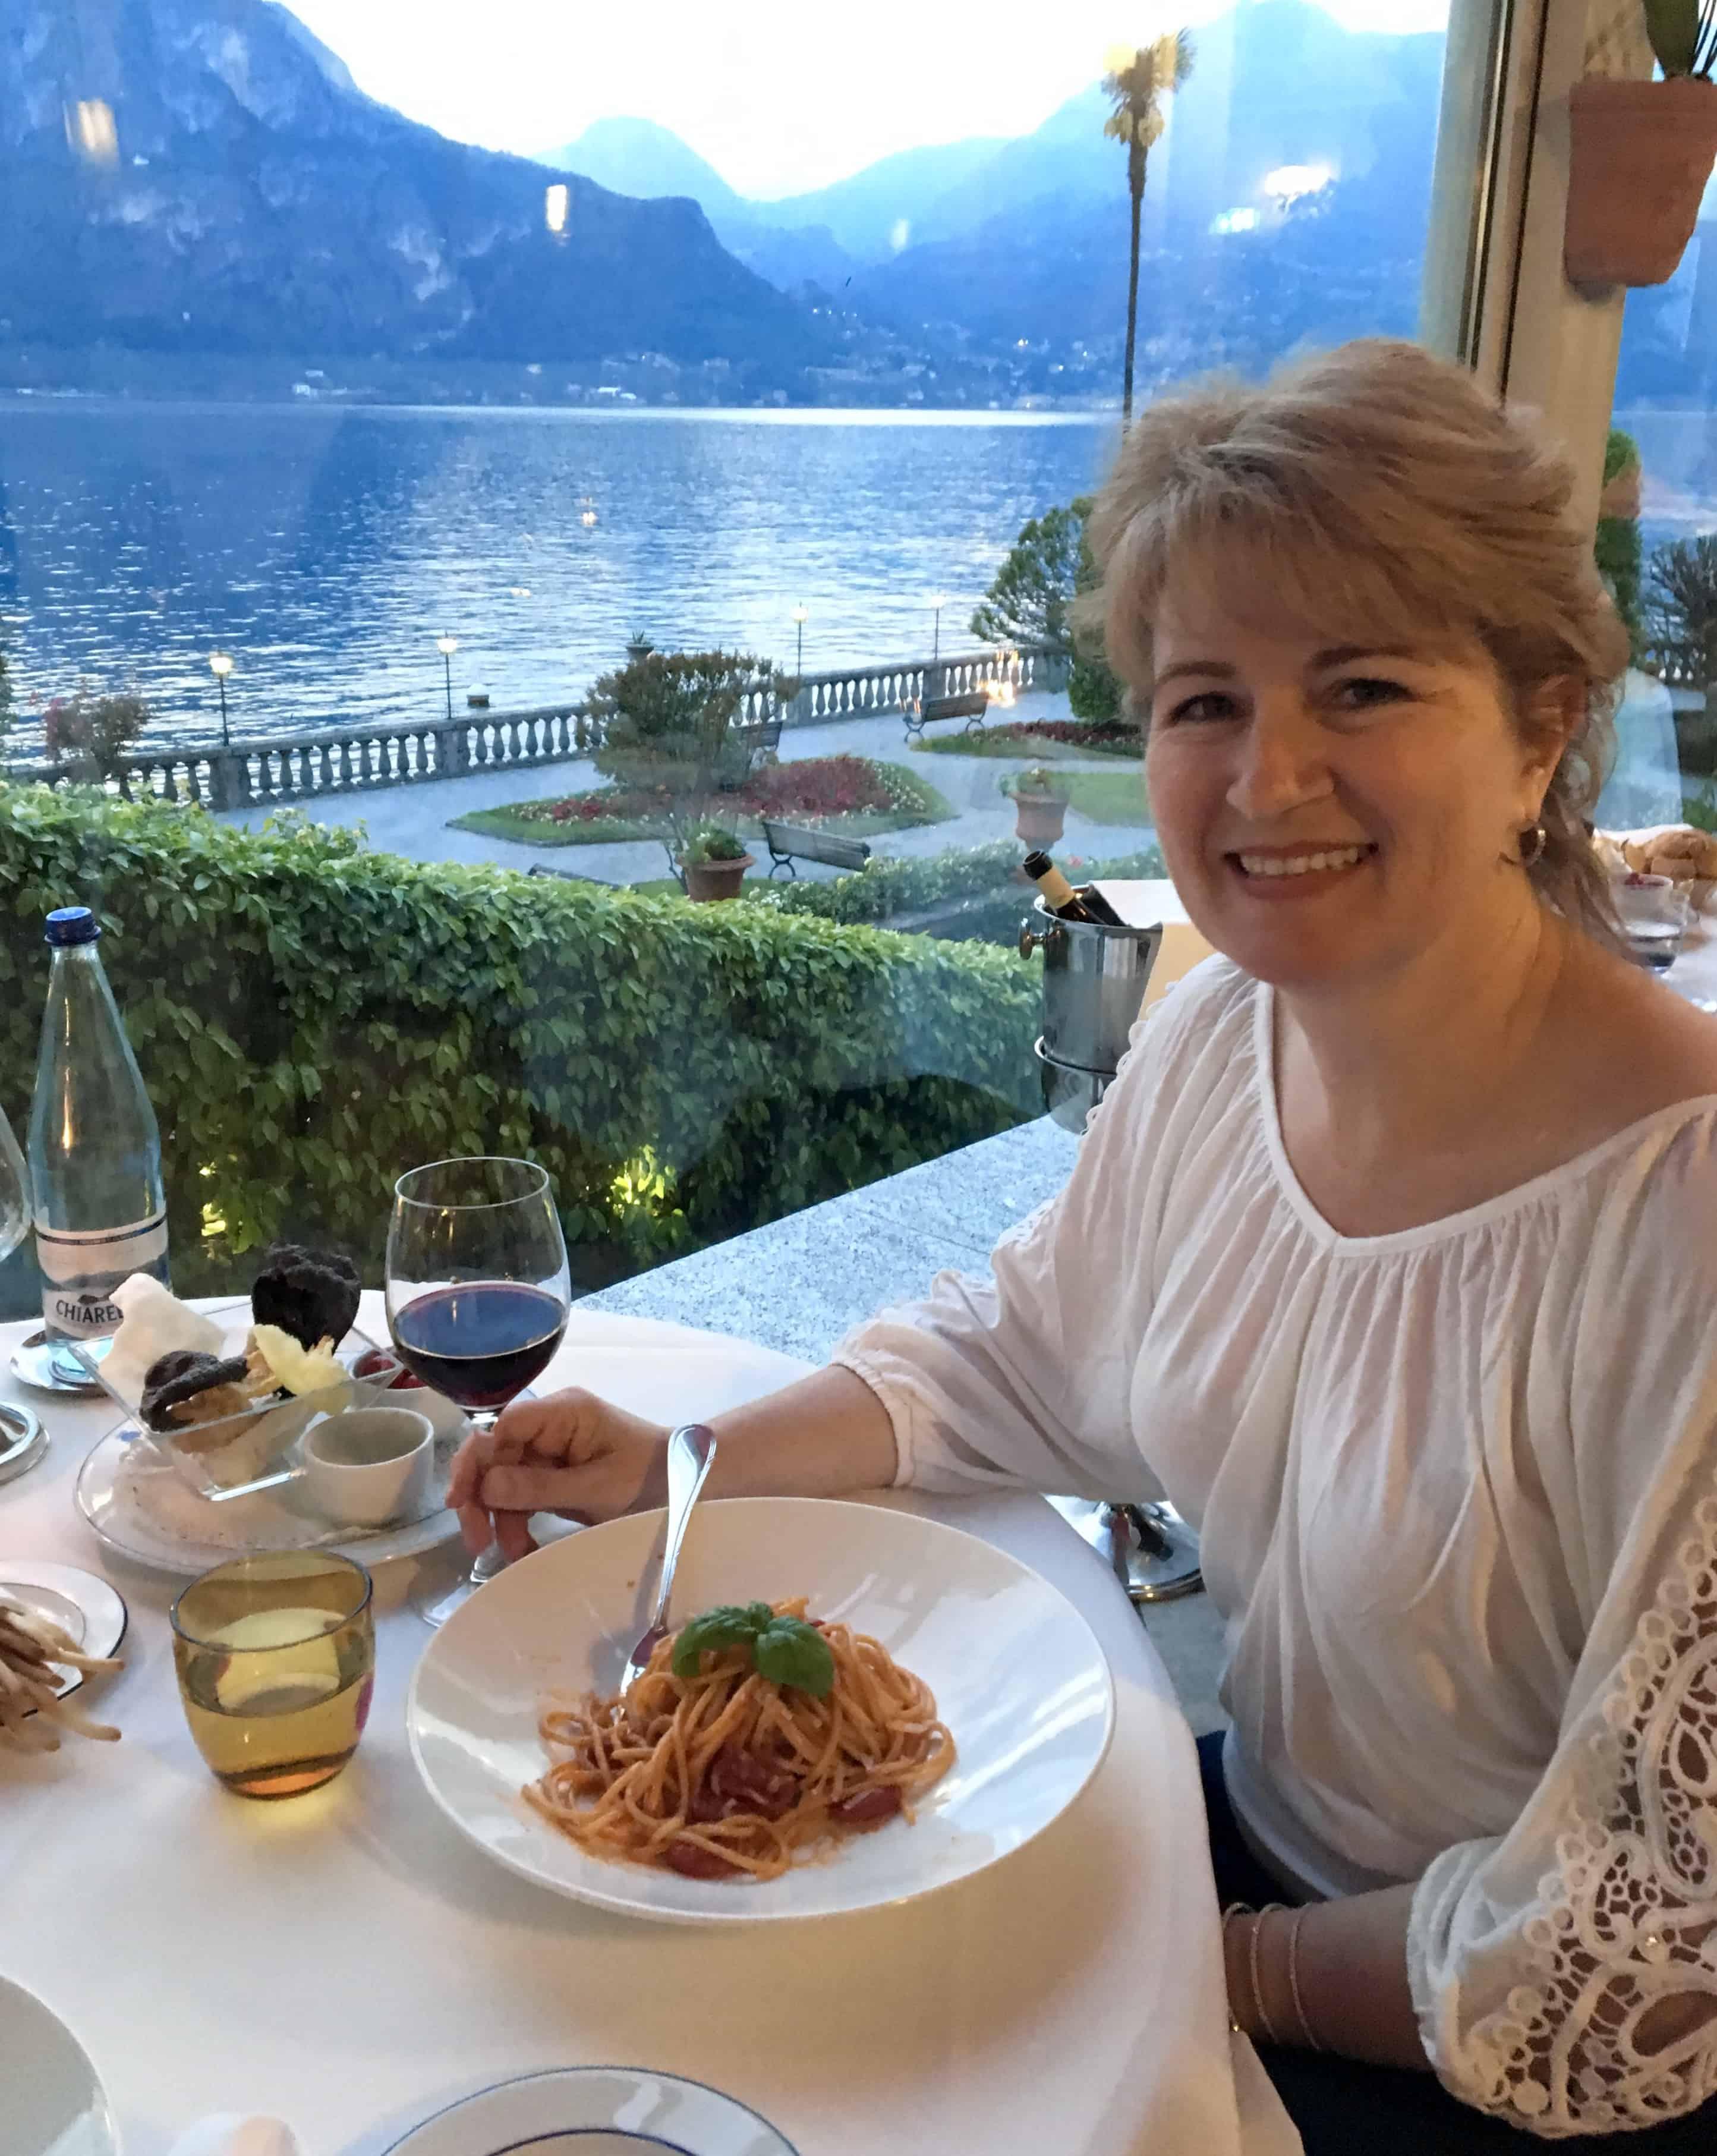 Christina Conte (Christina's Cucina) at Mistral, Grand Hotel Villa Serbelloni, Italy work with Christina's Cucina